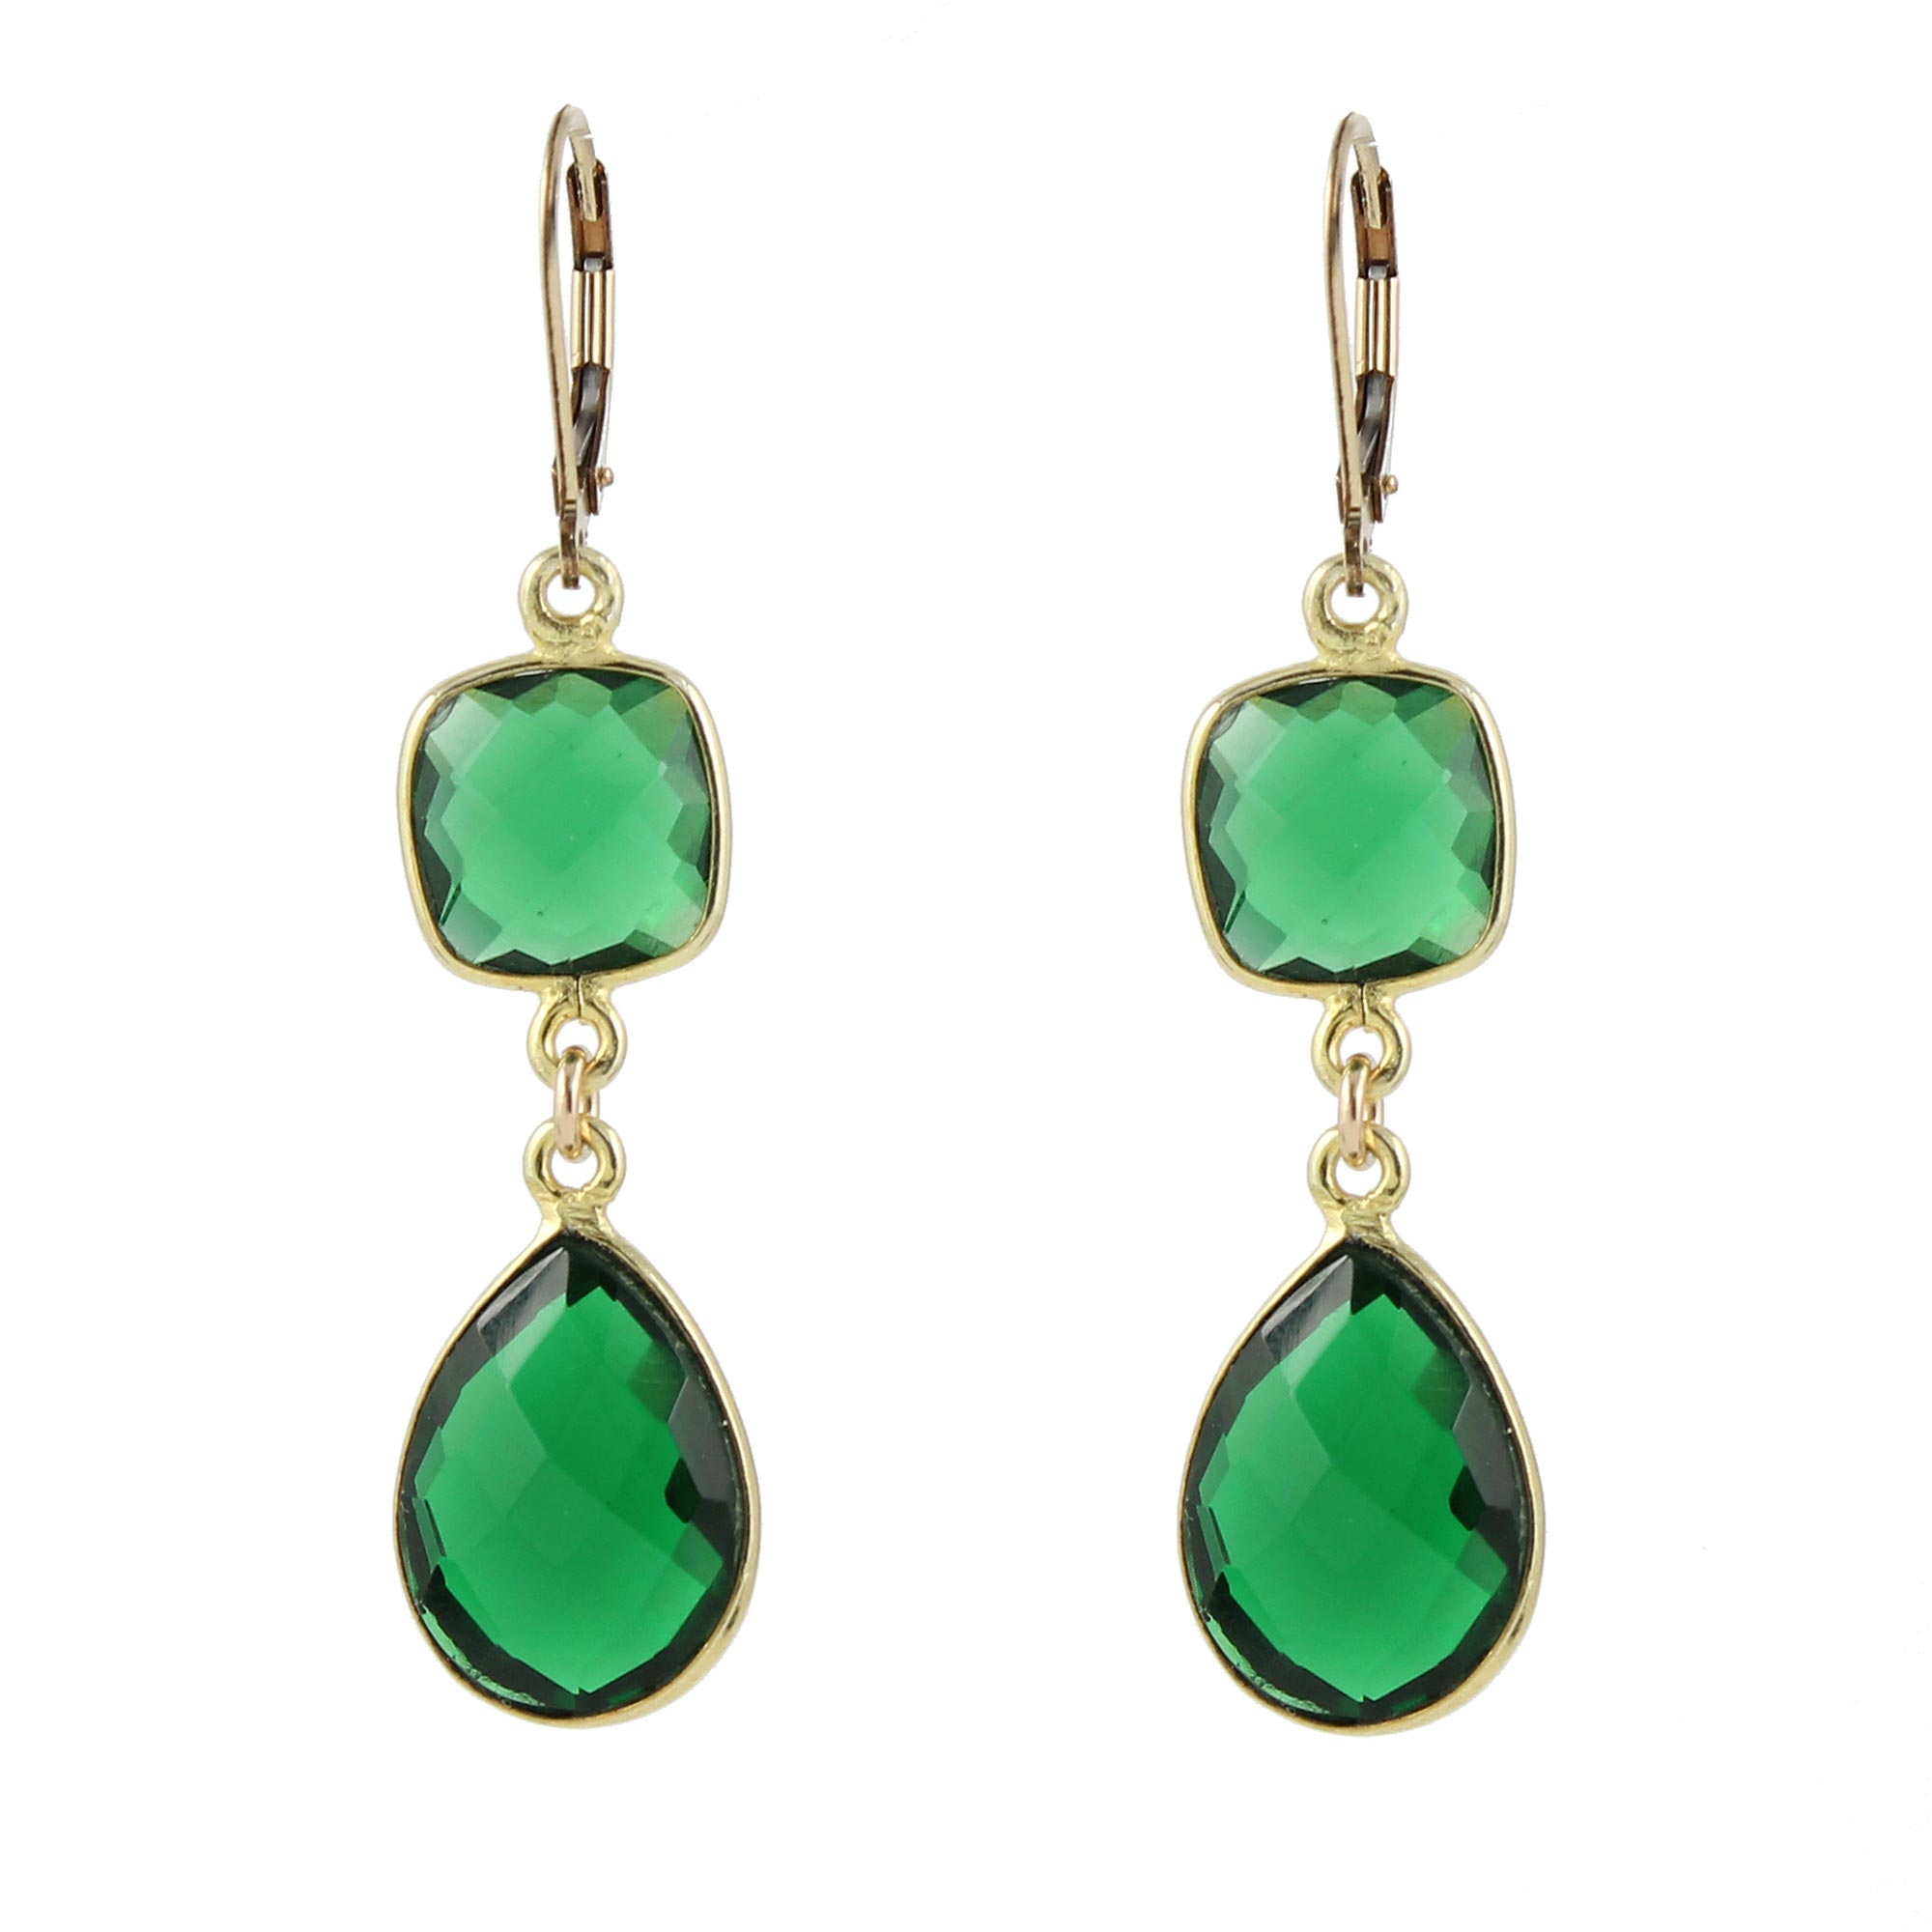 Peggy Li green earrings (photo attached; credit Peggy Li Creations)